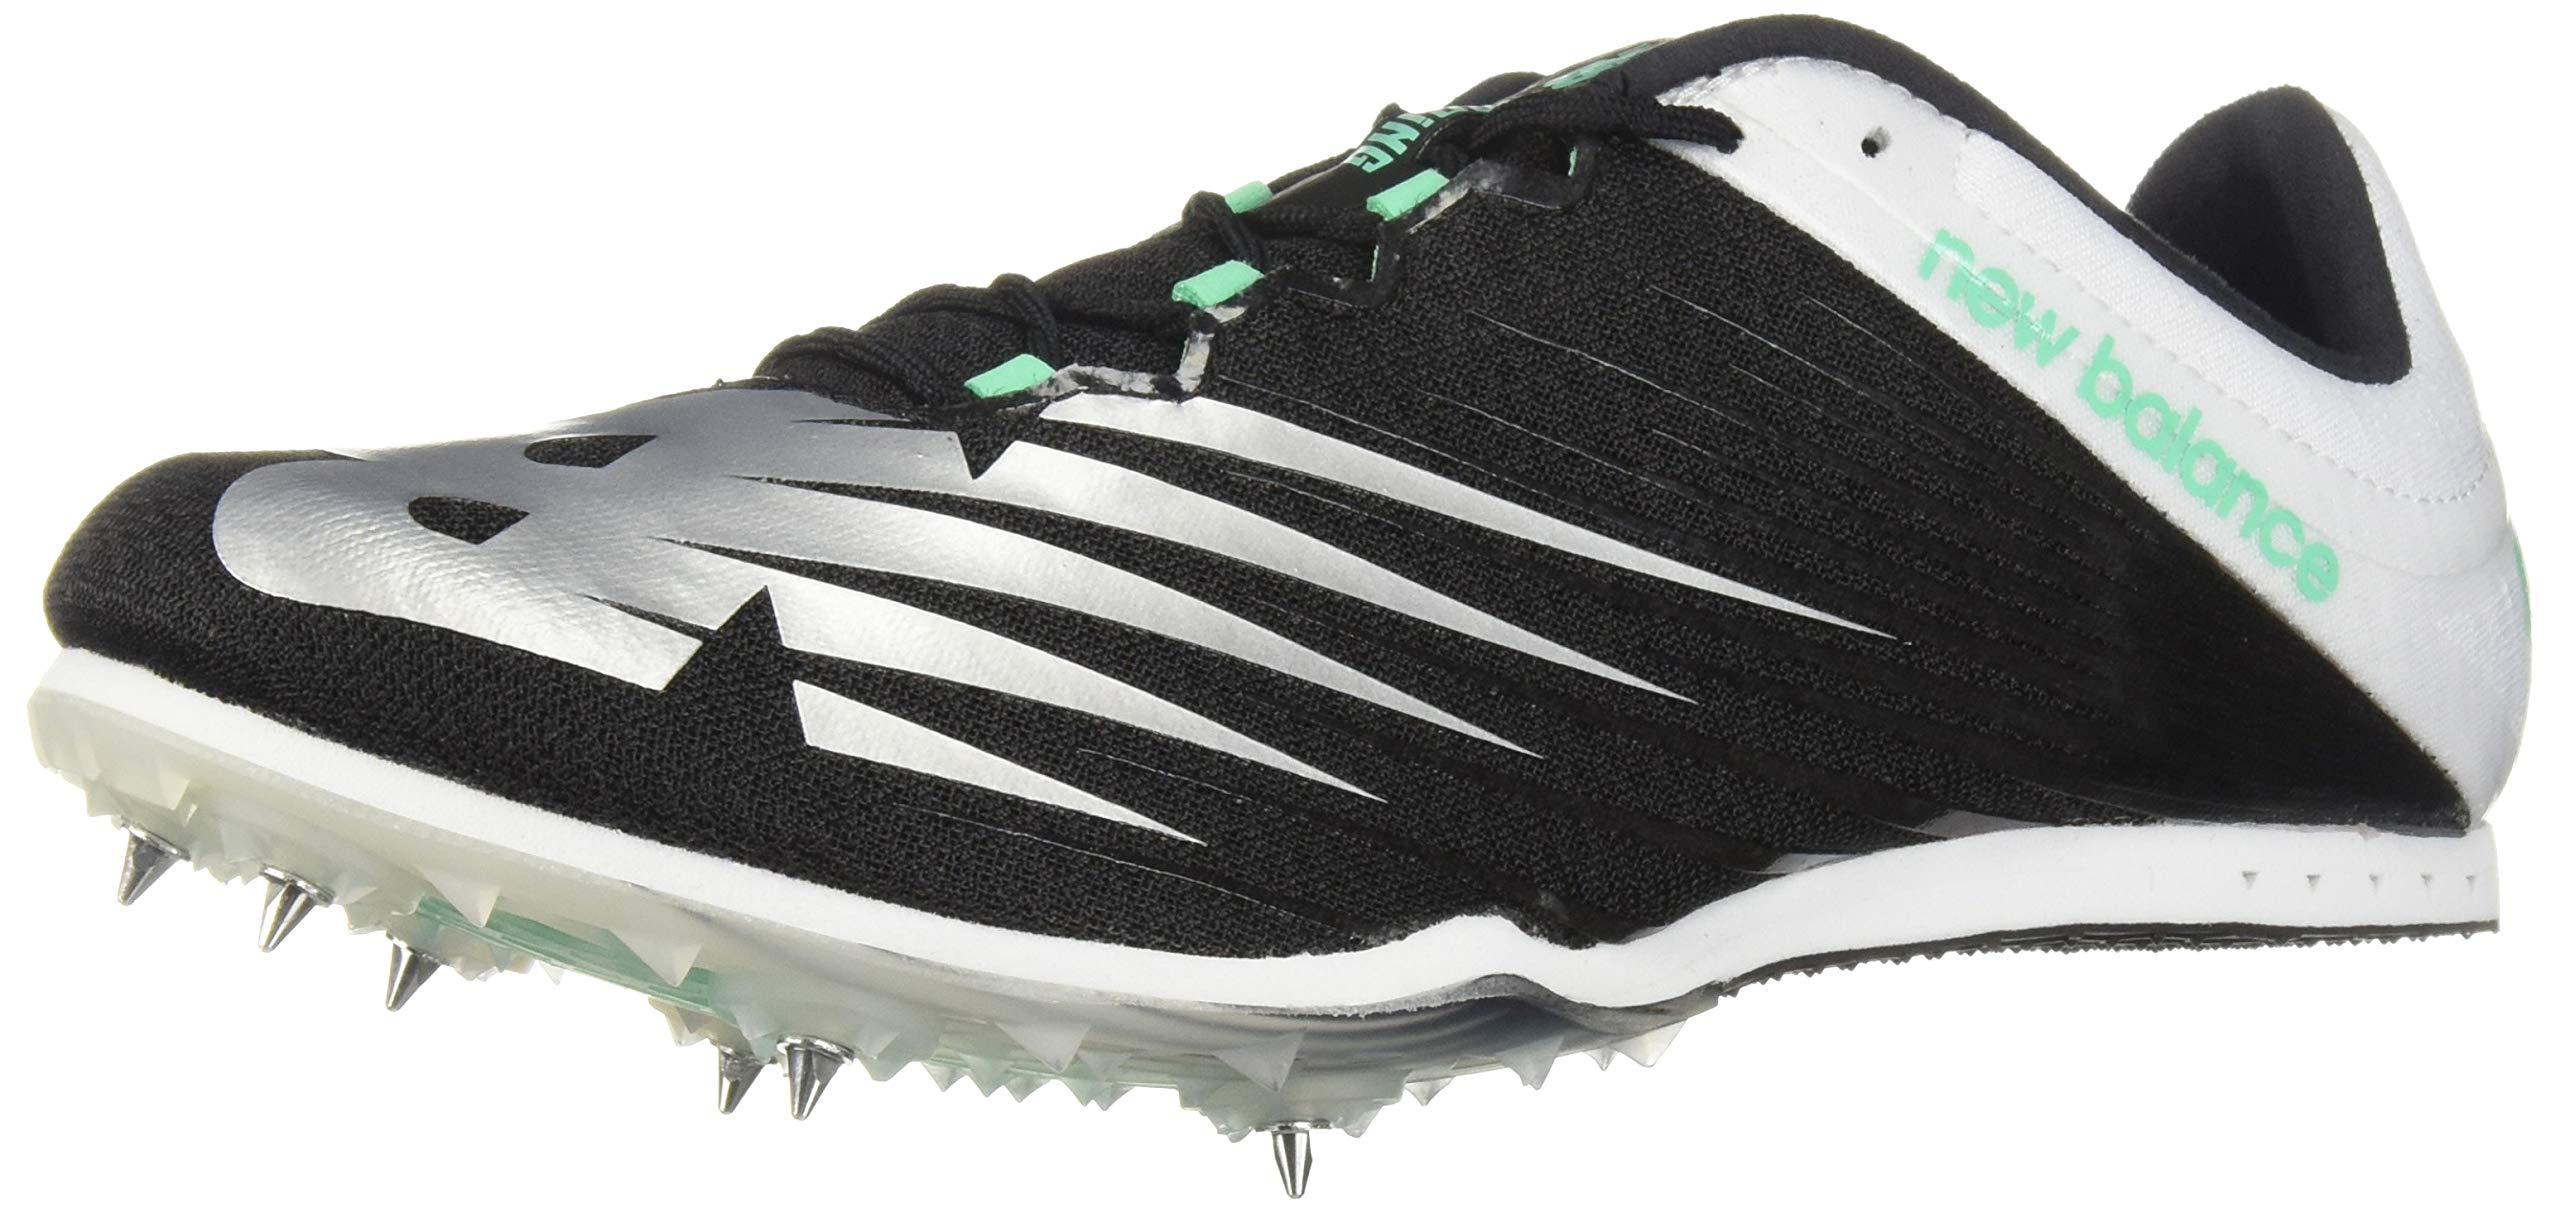 New Balance Men's 500v6 Track Shoe Black/White 11.5